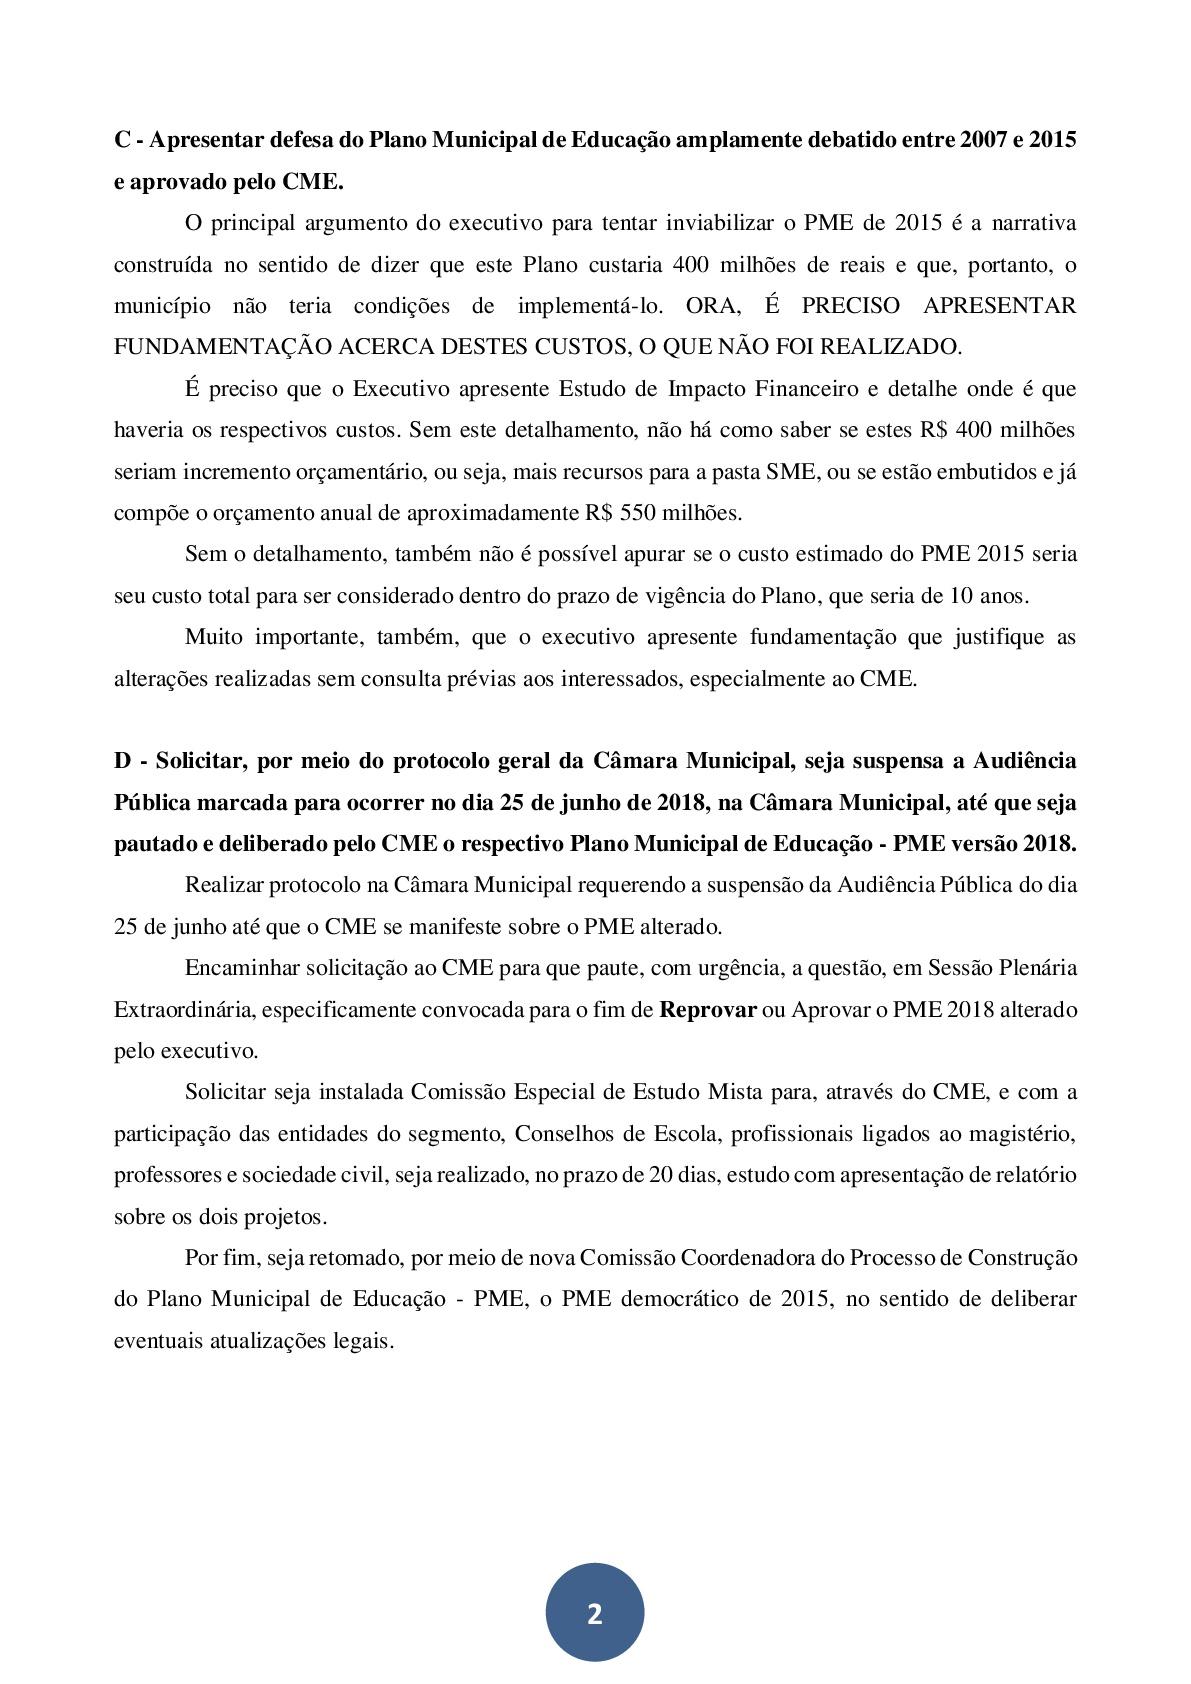 TEXTO_REUNIAO_SINDICATO_ENTIDADES_21_06_2018-002